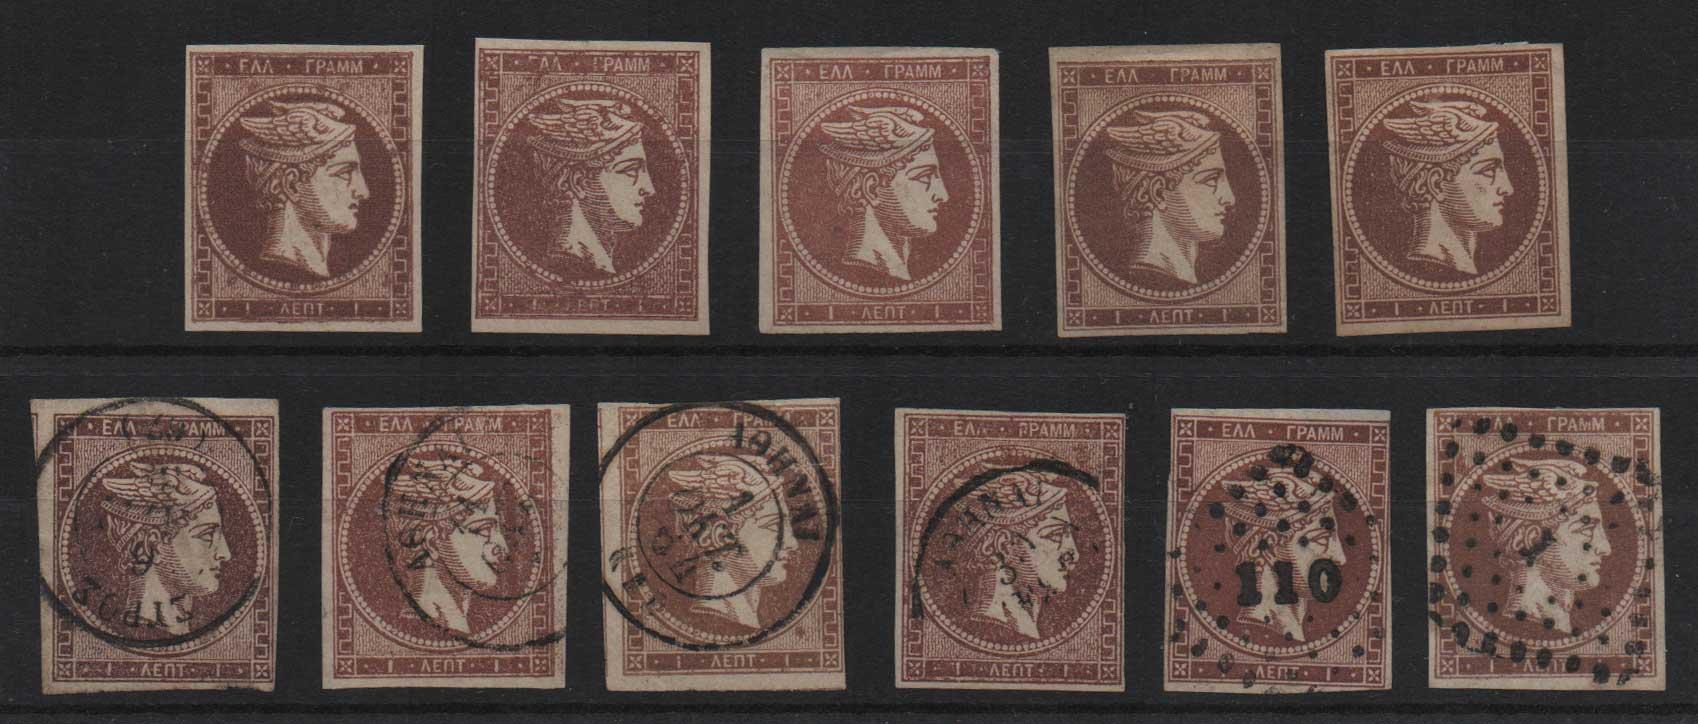 Lot 5 - -  LARGE HERMES HEAD large hermes head -  Athens Auctions Public Auction 70 General Stamp Sale